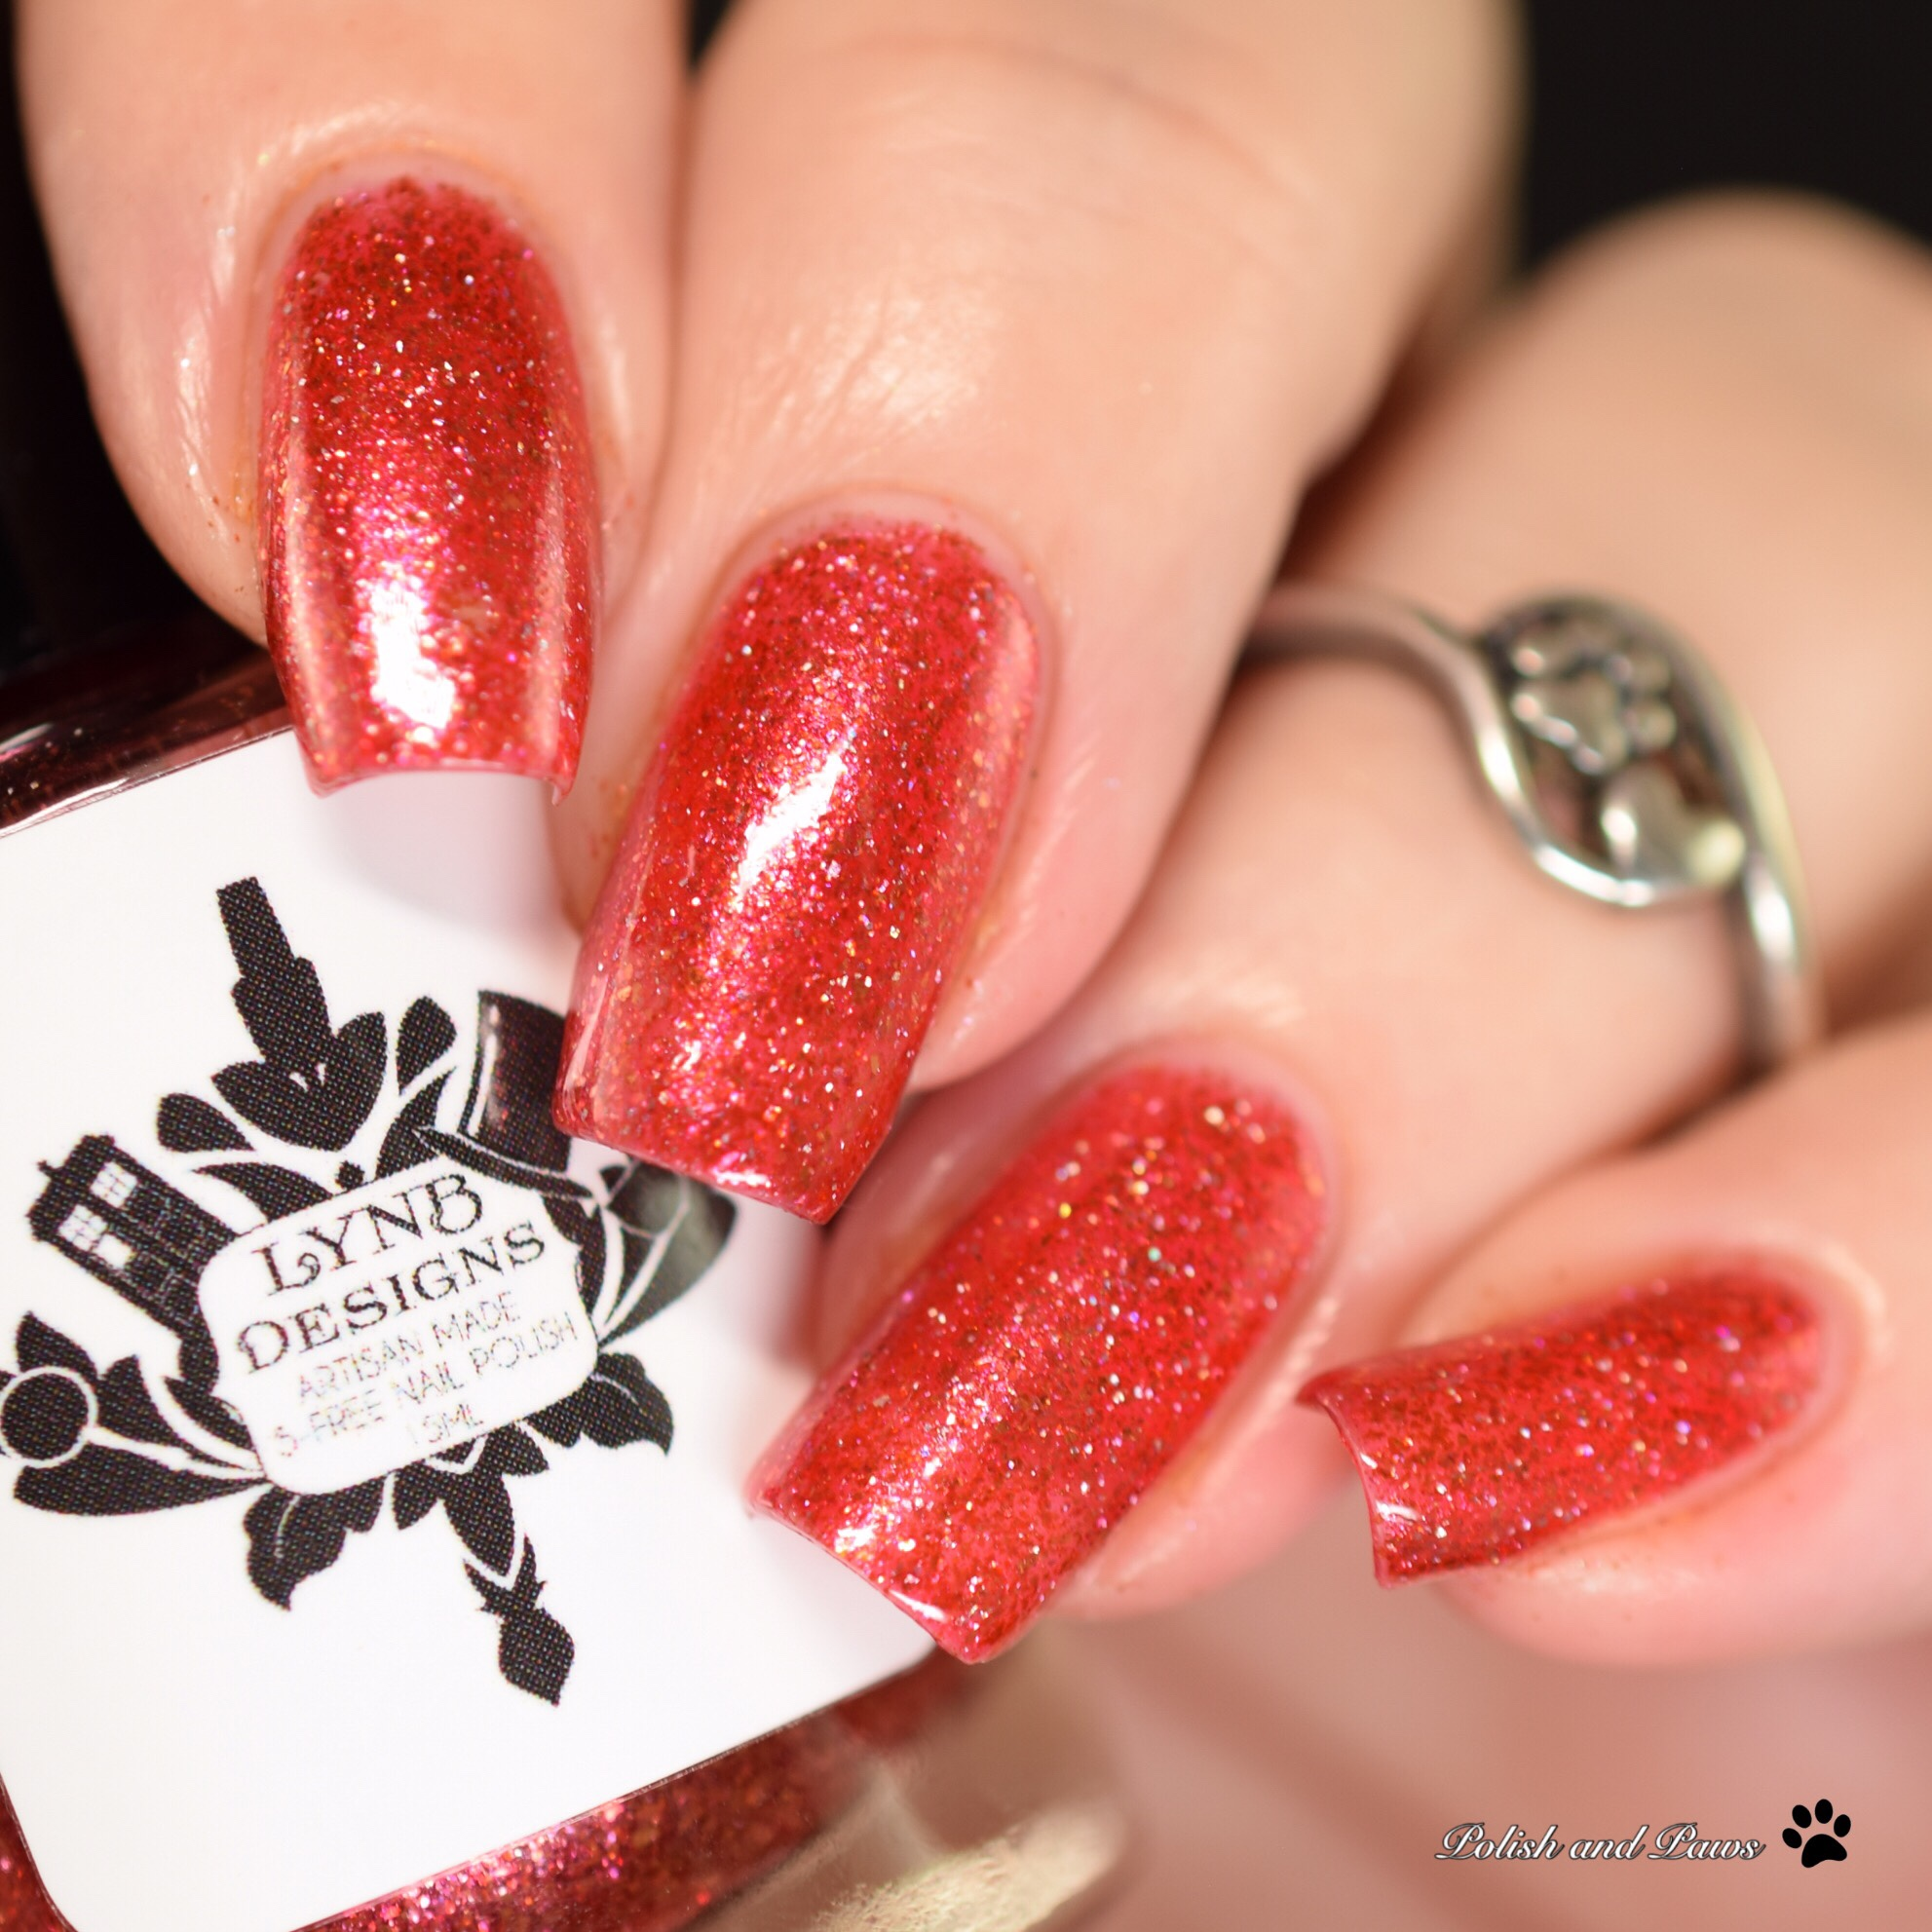 LynB Designs Red Hot Ri Ri